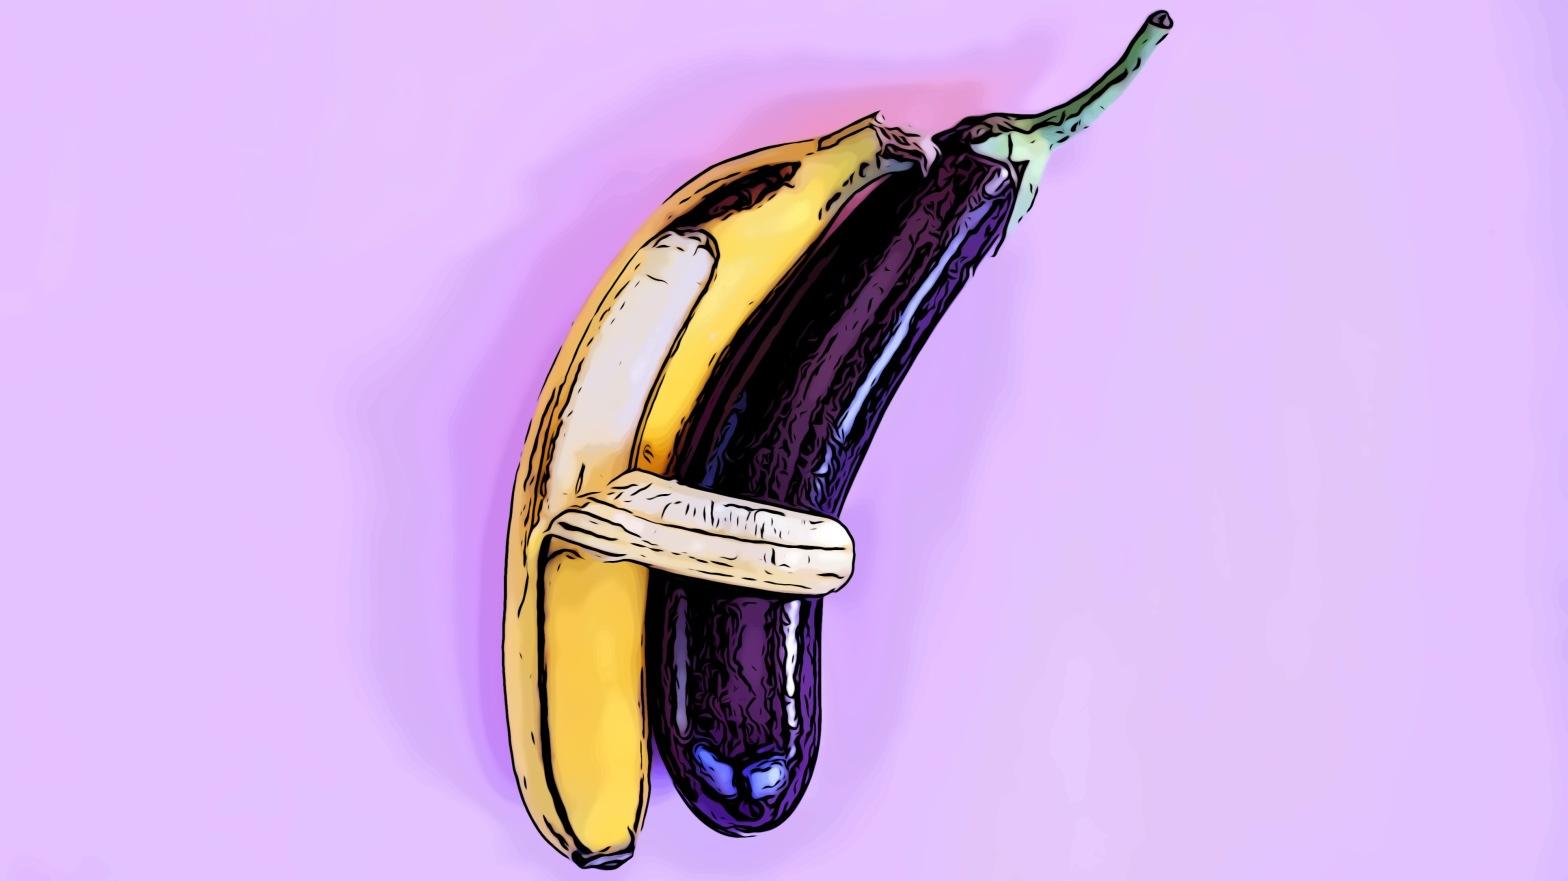 Eggplant banana header comic